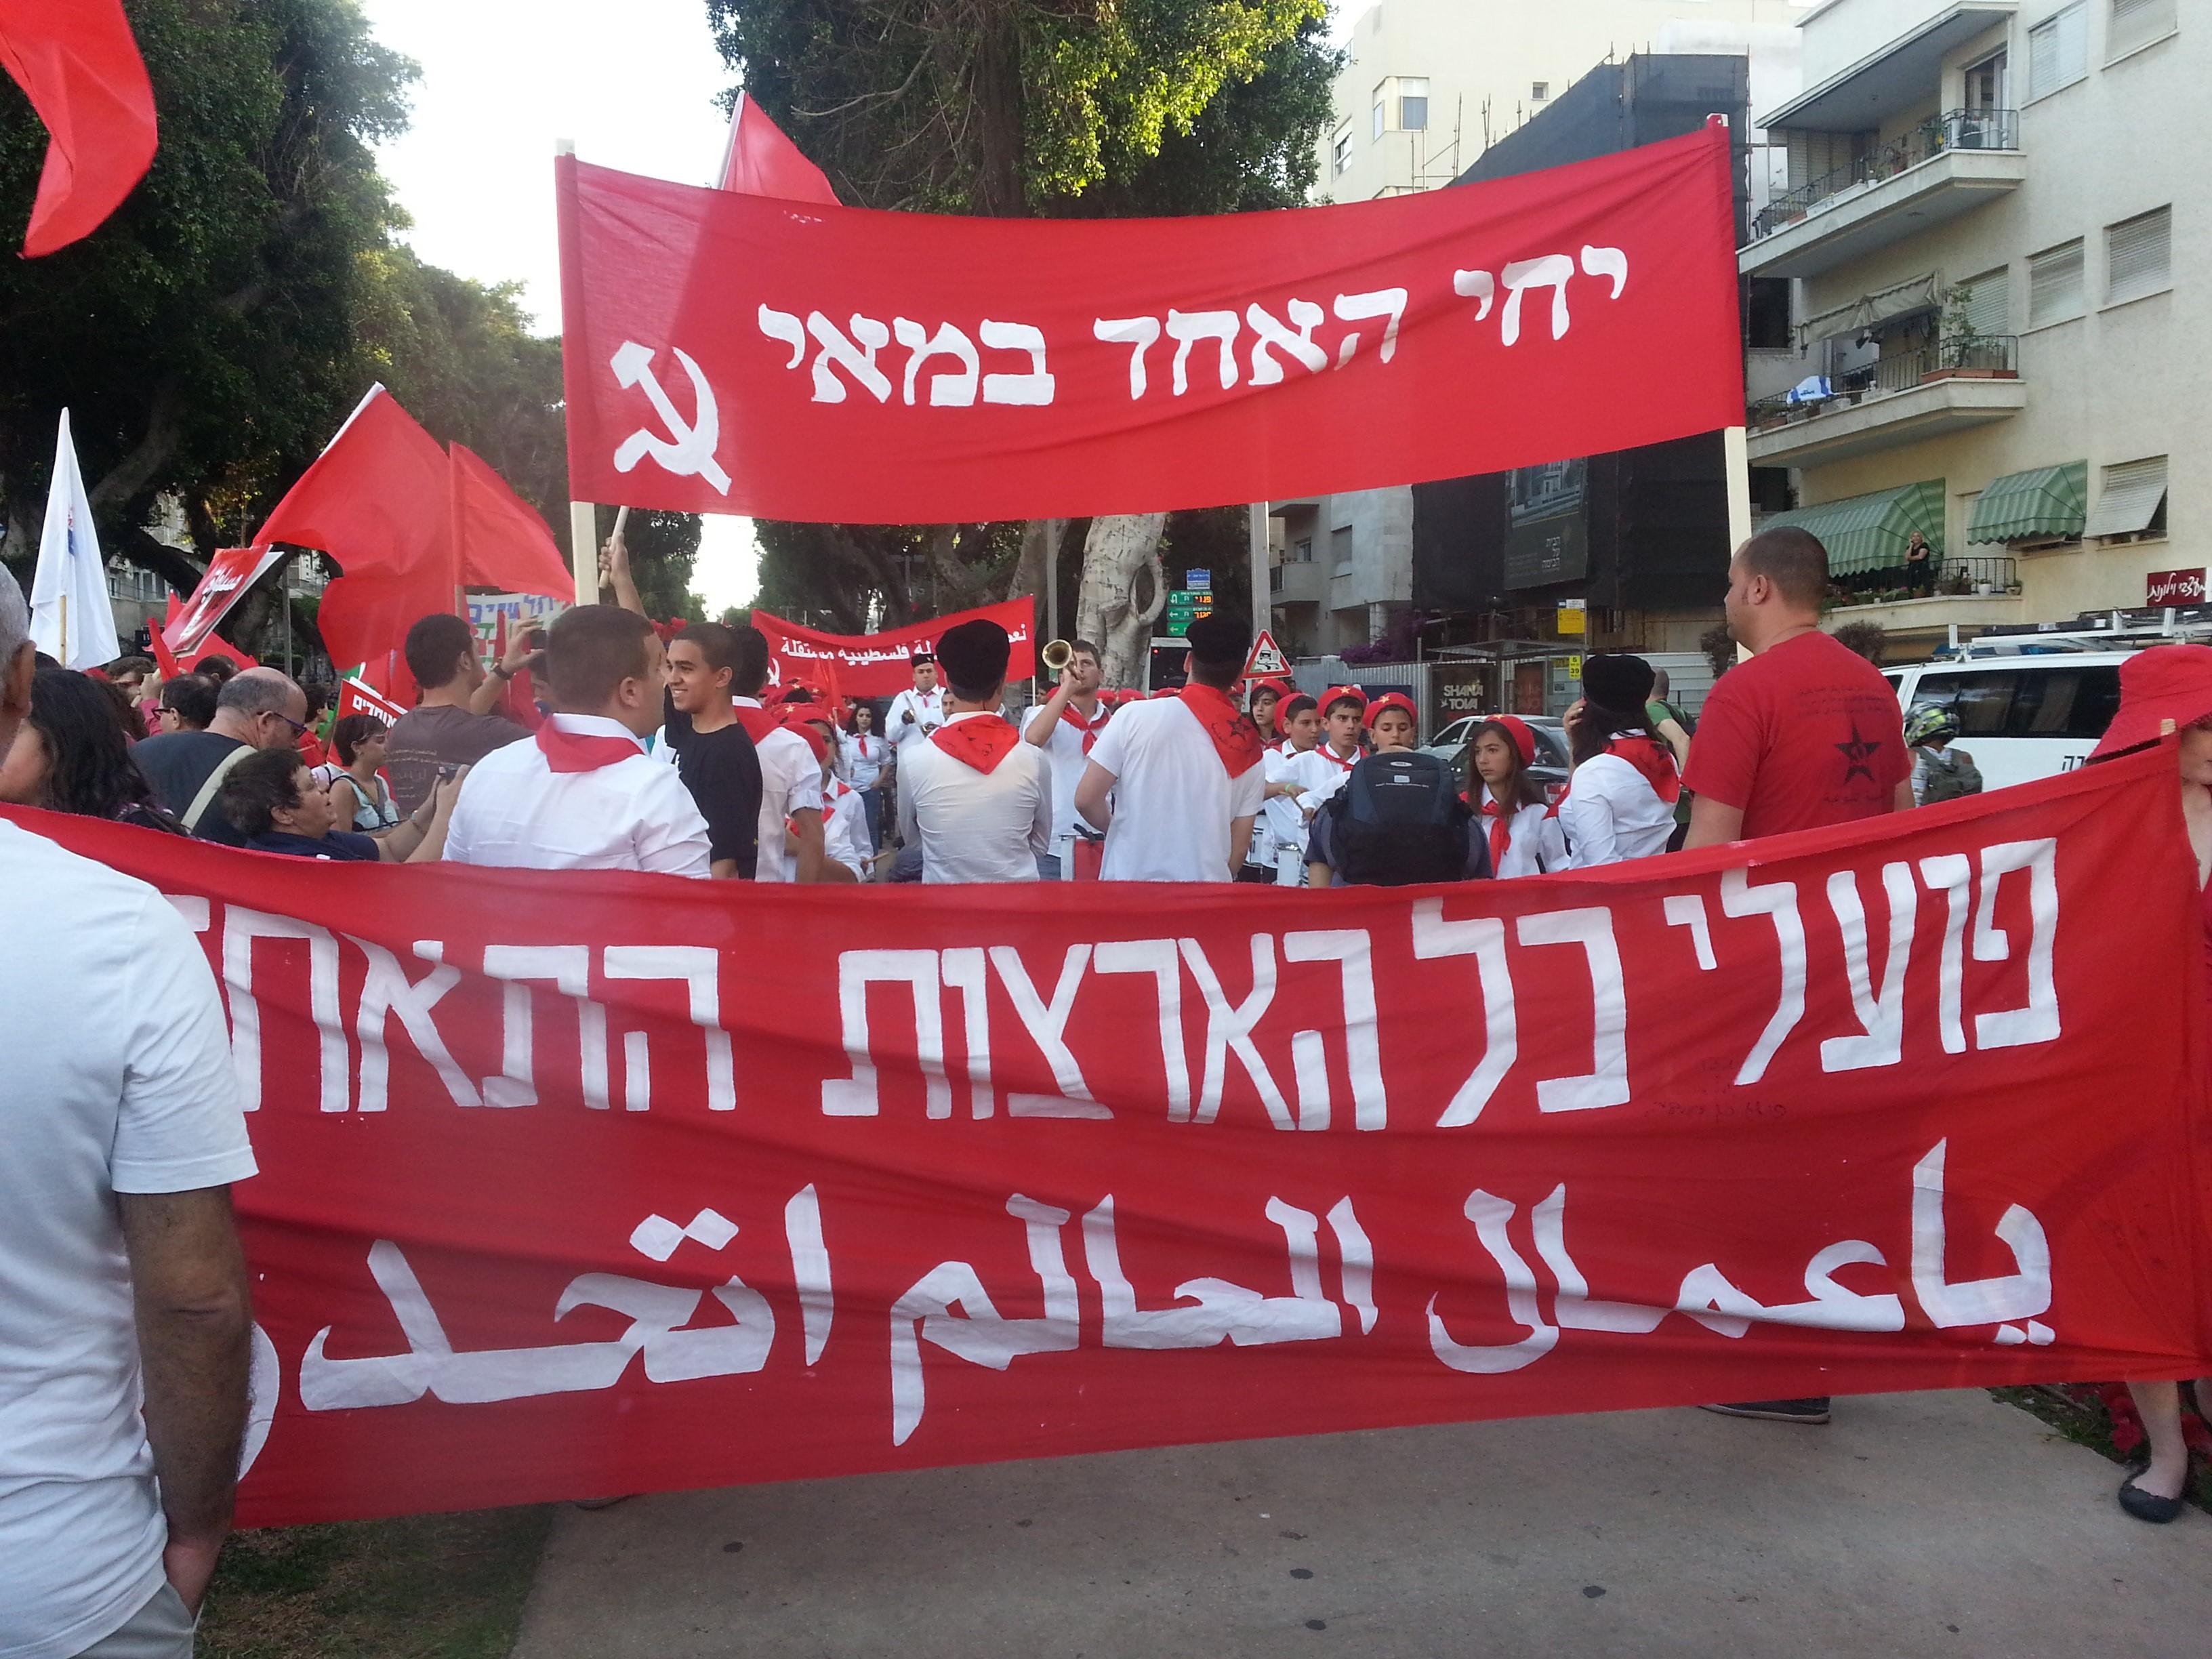 İsrail'in komünistleri